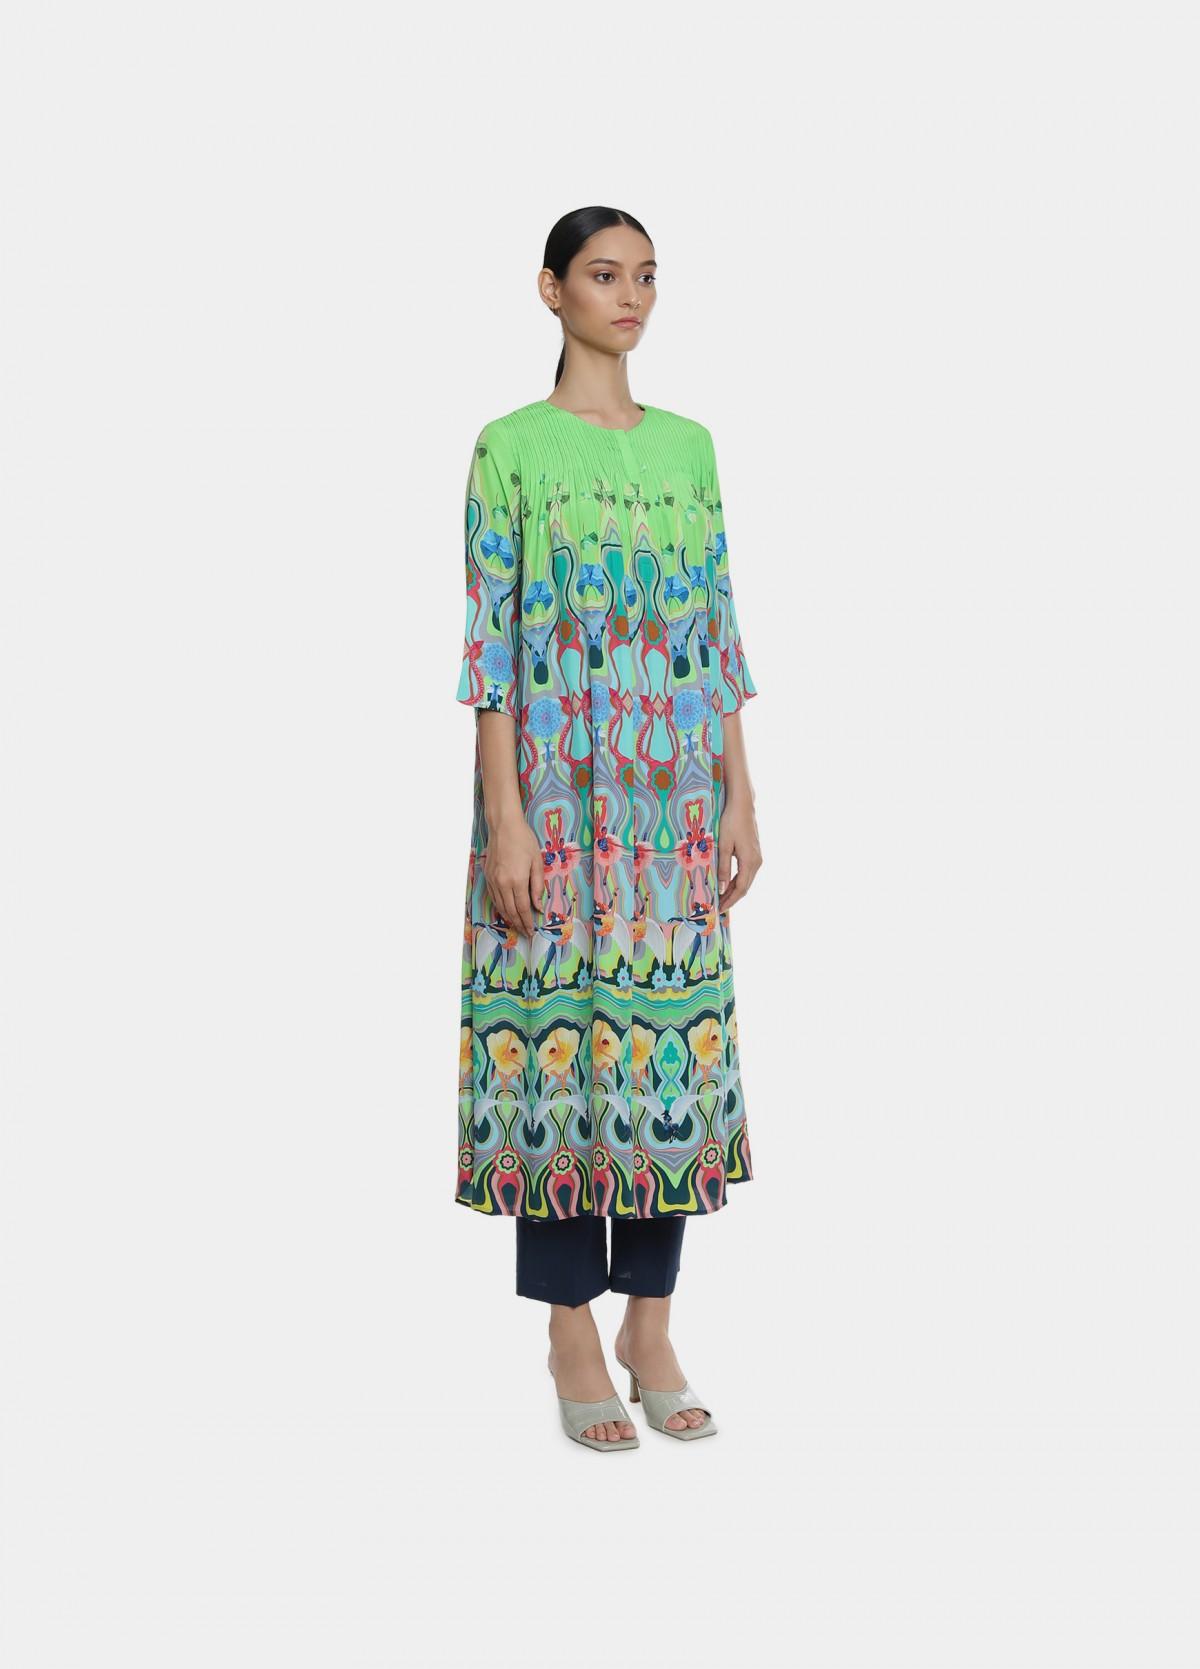 The Zest Dress